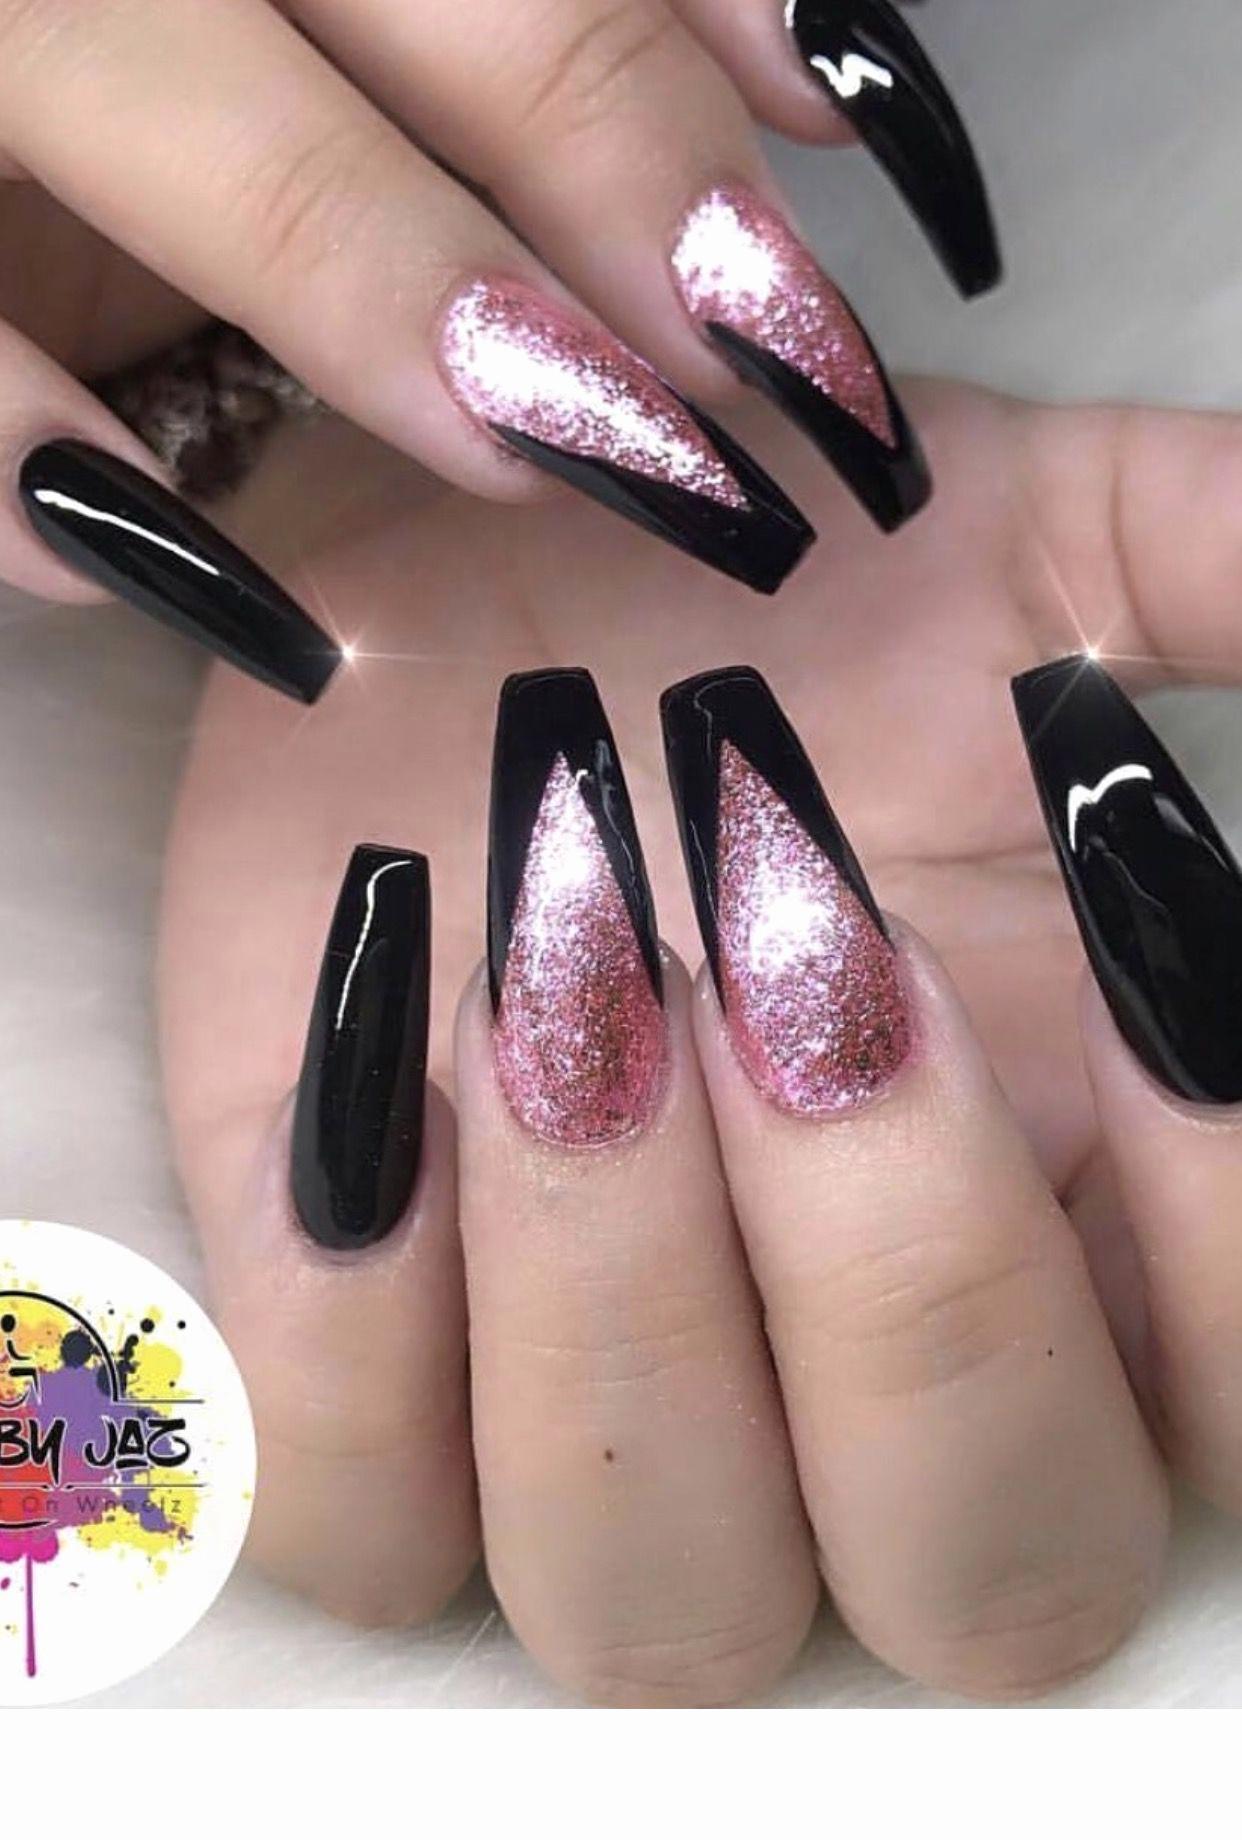 Acrylic Nail Designs 2019 Awesome Black and Pink Nails Hair Skin Nails In 2019